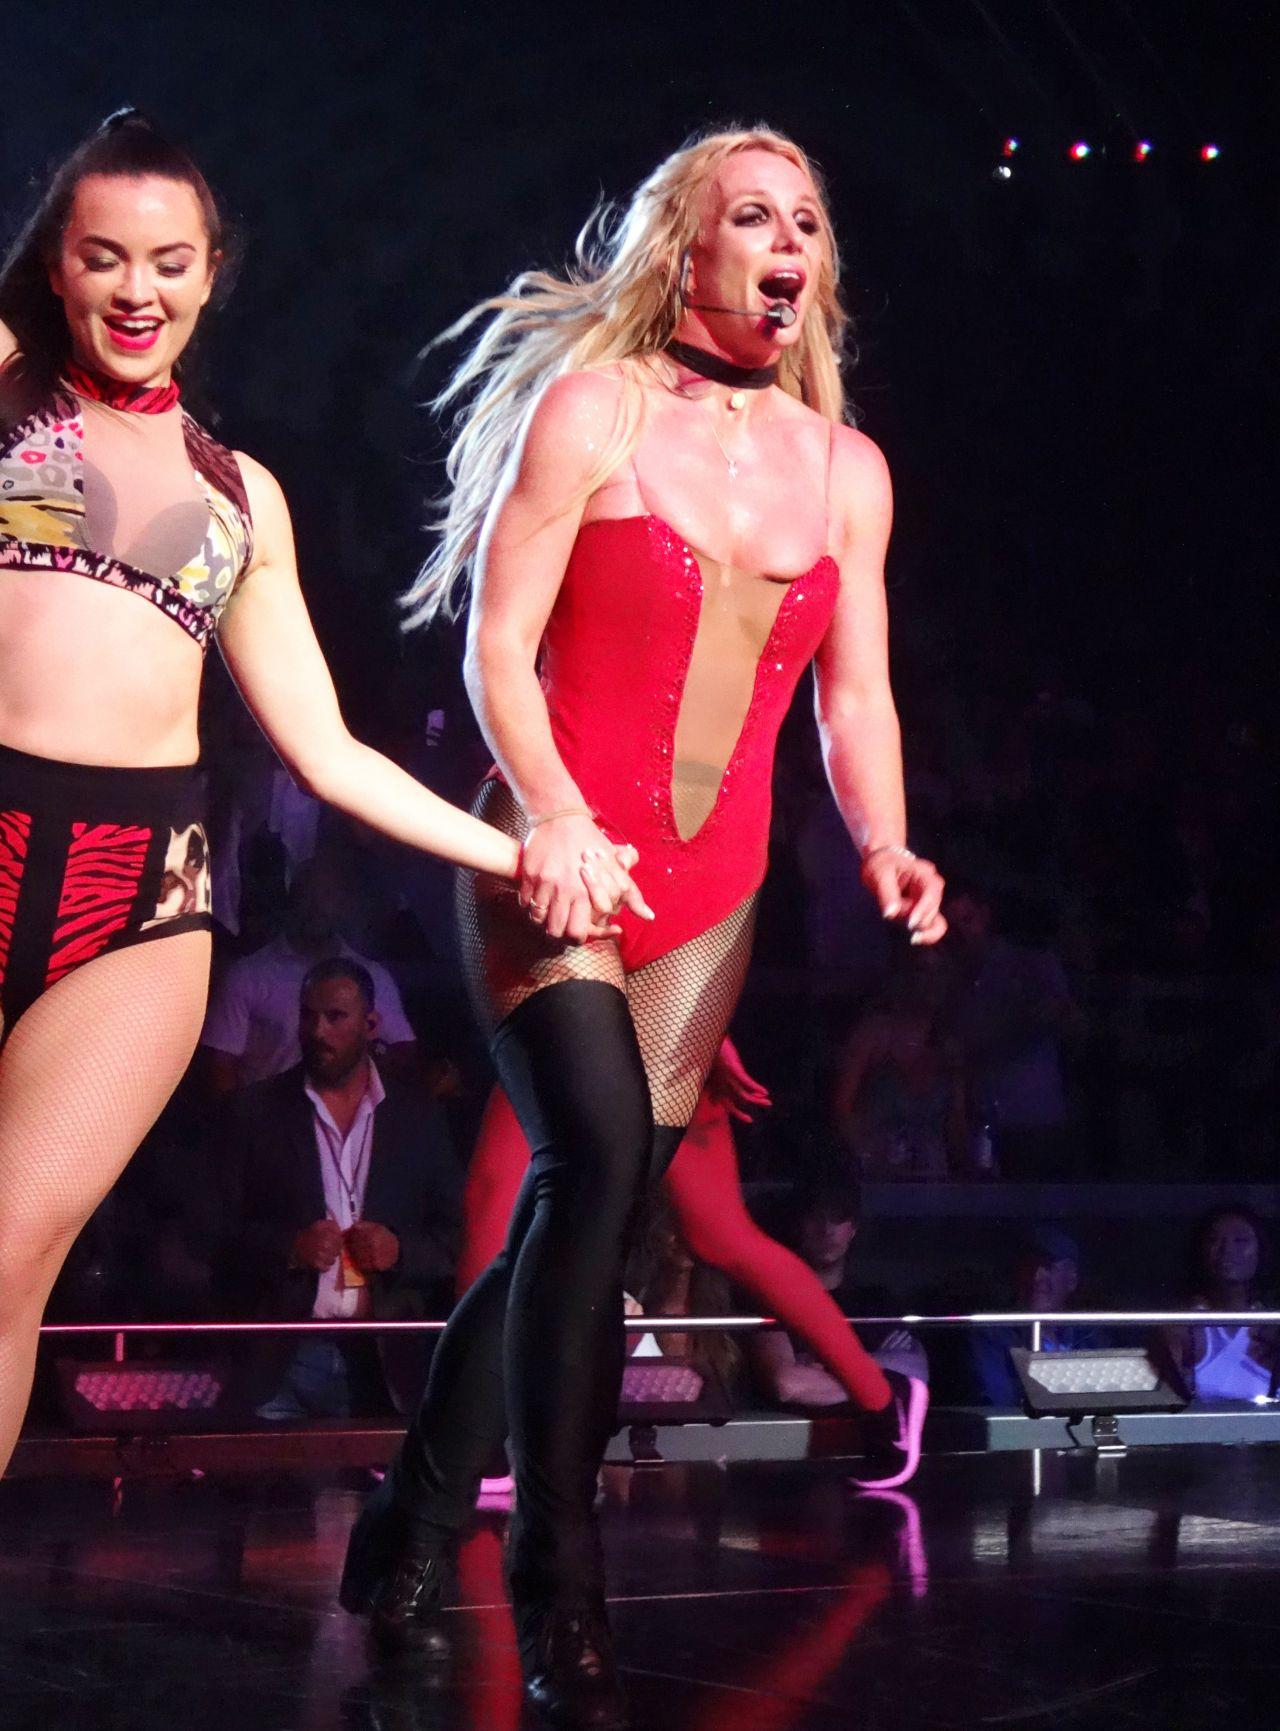 Imogen thomas sexy 5 new photos,Dana brooke sexy leaked 7 Photos Erotic videos Jessica rose nude,Alyssa jirrels